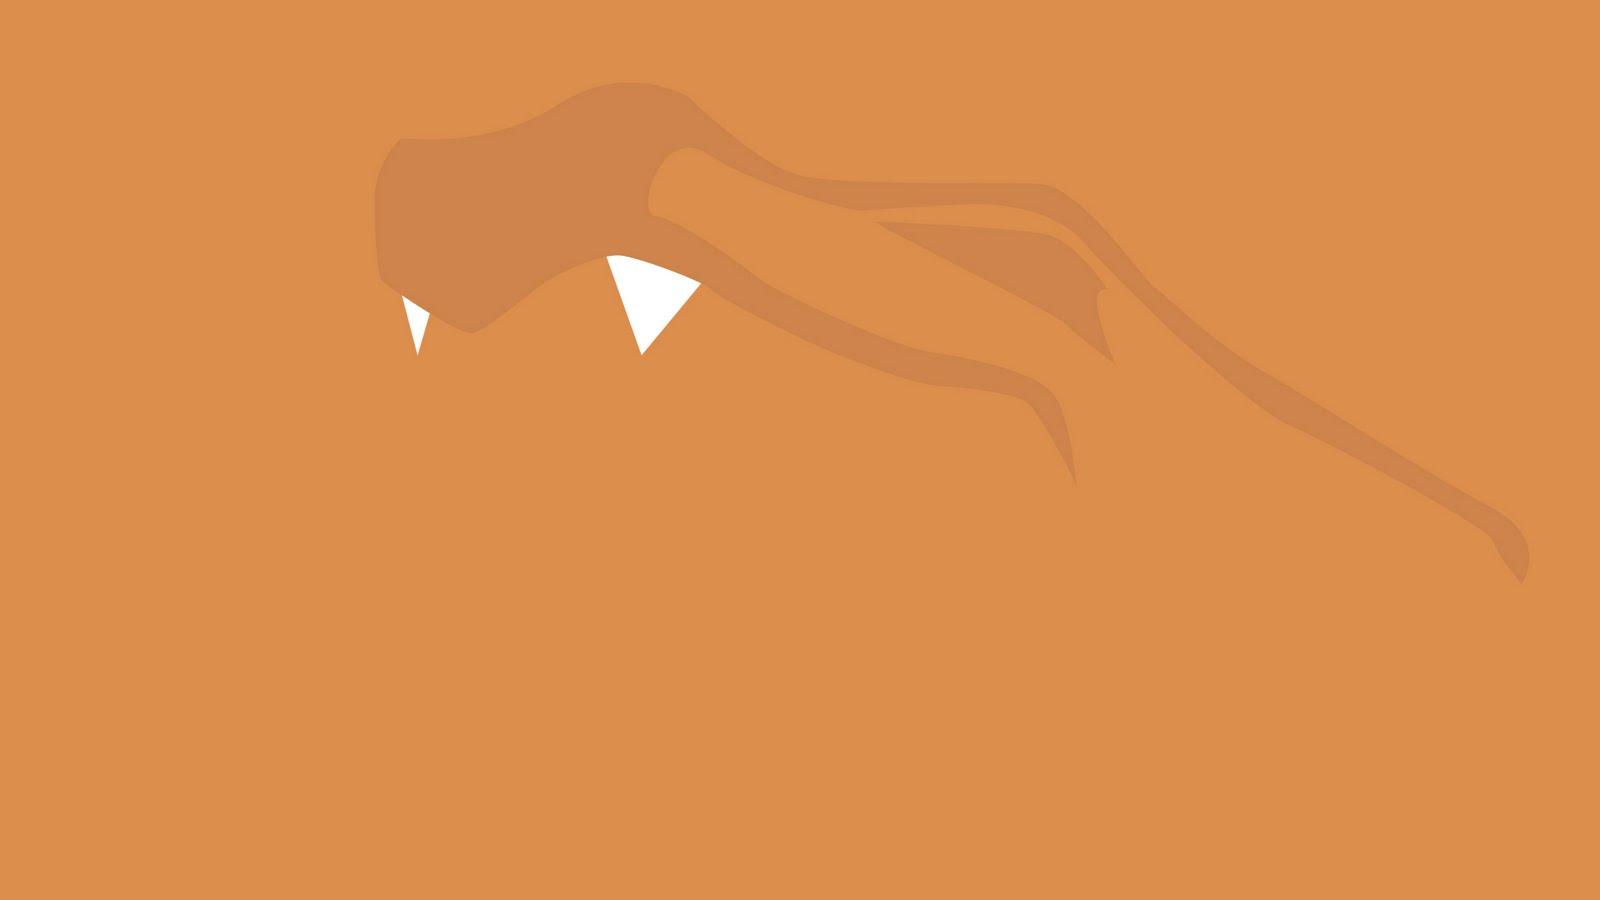 trololo blogg minimalist pokemon wallpaper download